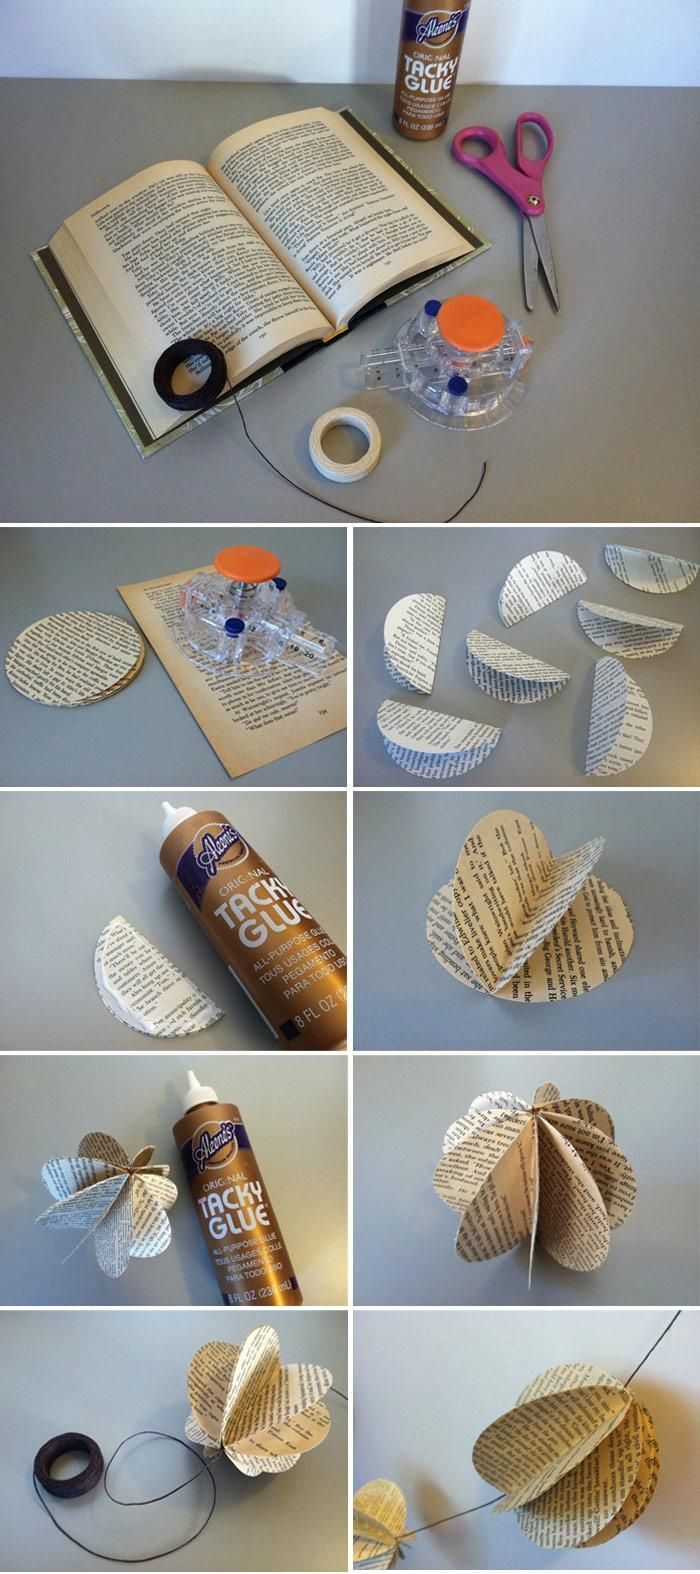 DIY Decorative Book Garland - image 2 - student project